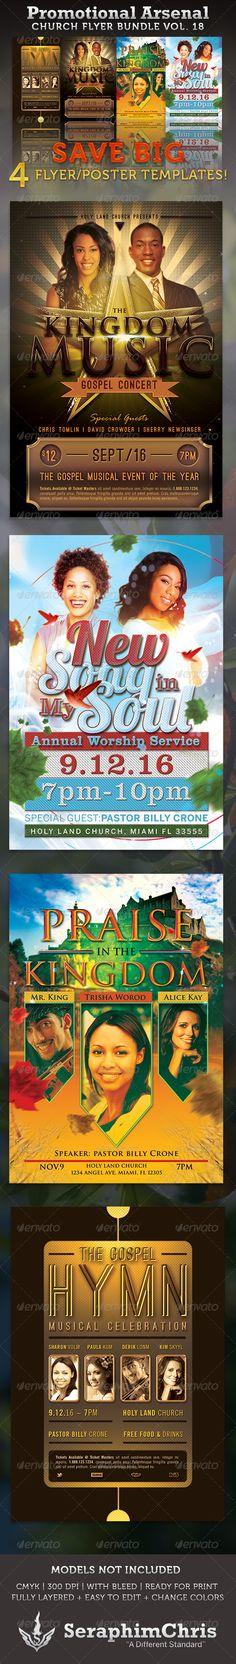 Church Marketing Flyer Bundle-Vol 010 Marketing flyers, Churches - promotional flyer template